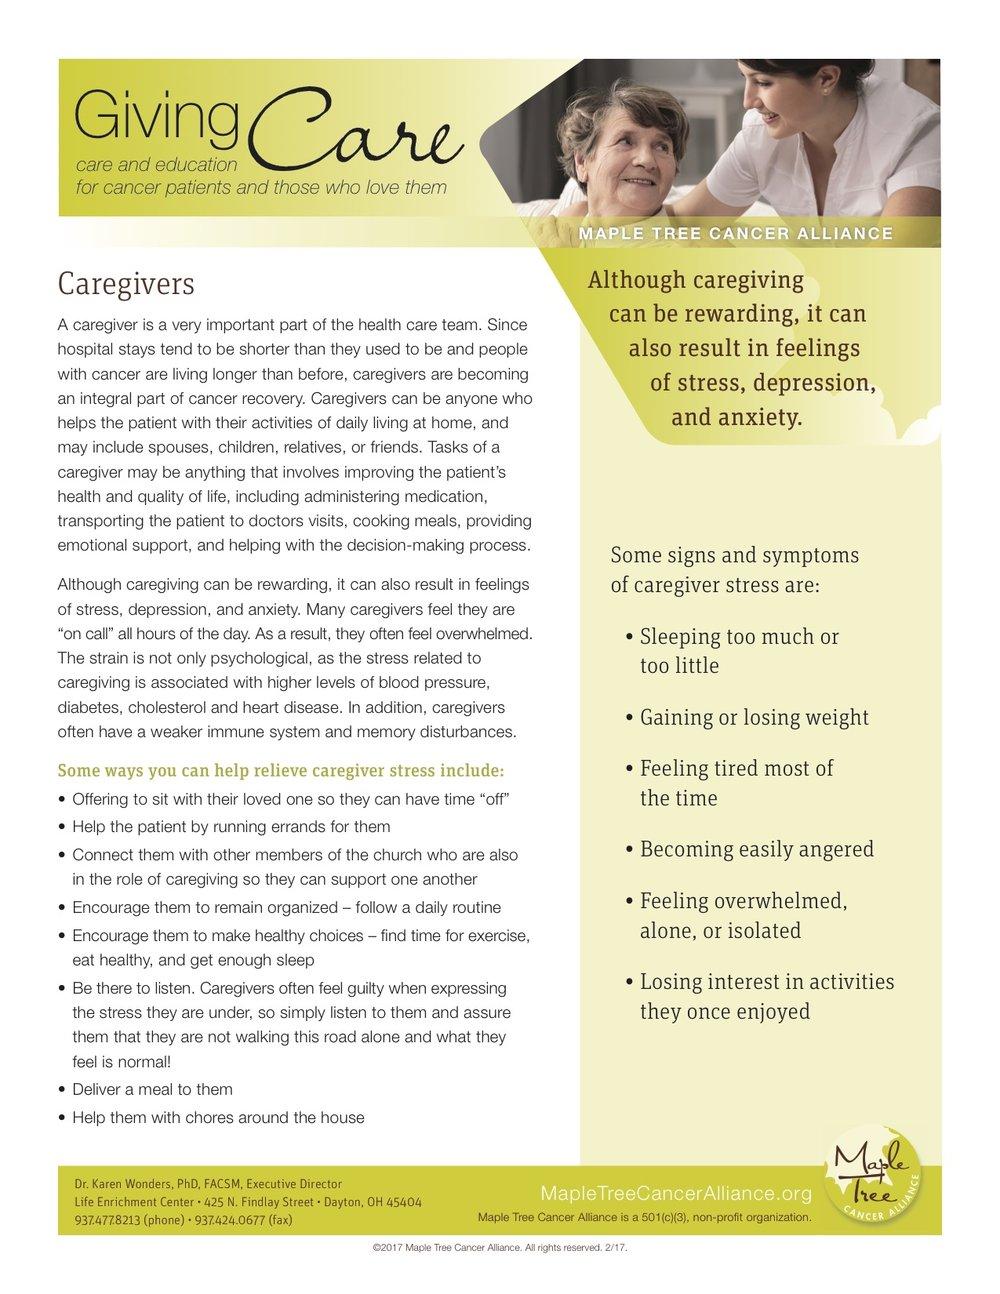 Caregivers_One Sheet.jpg